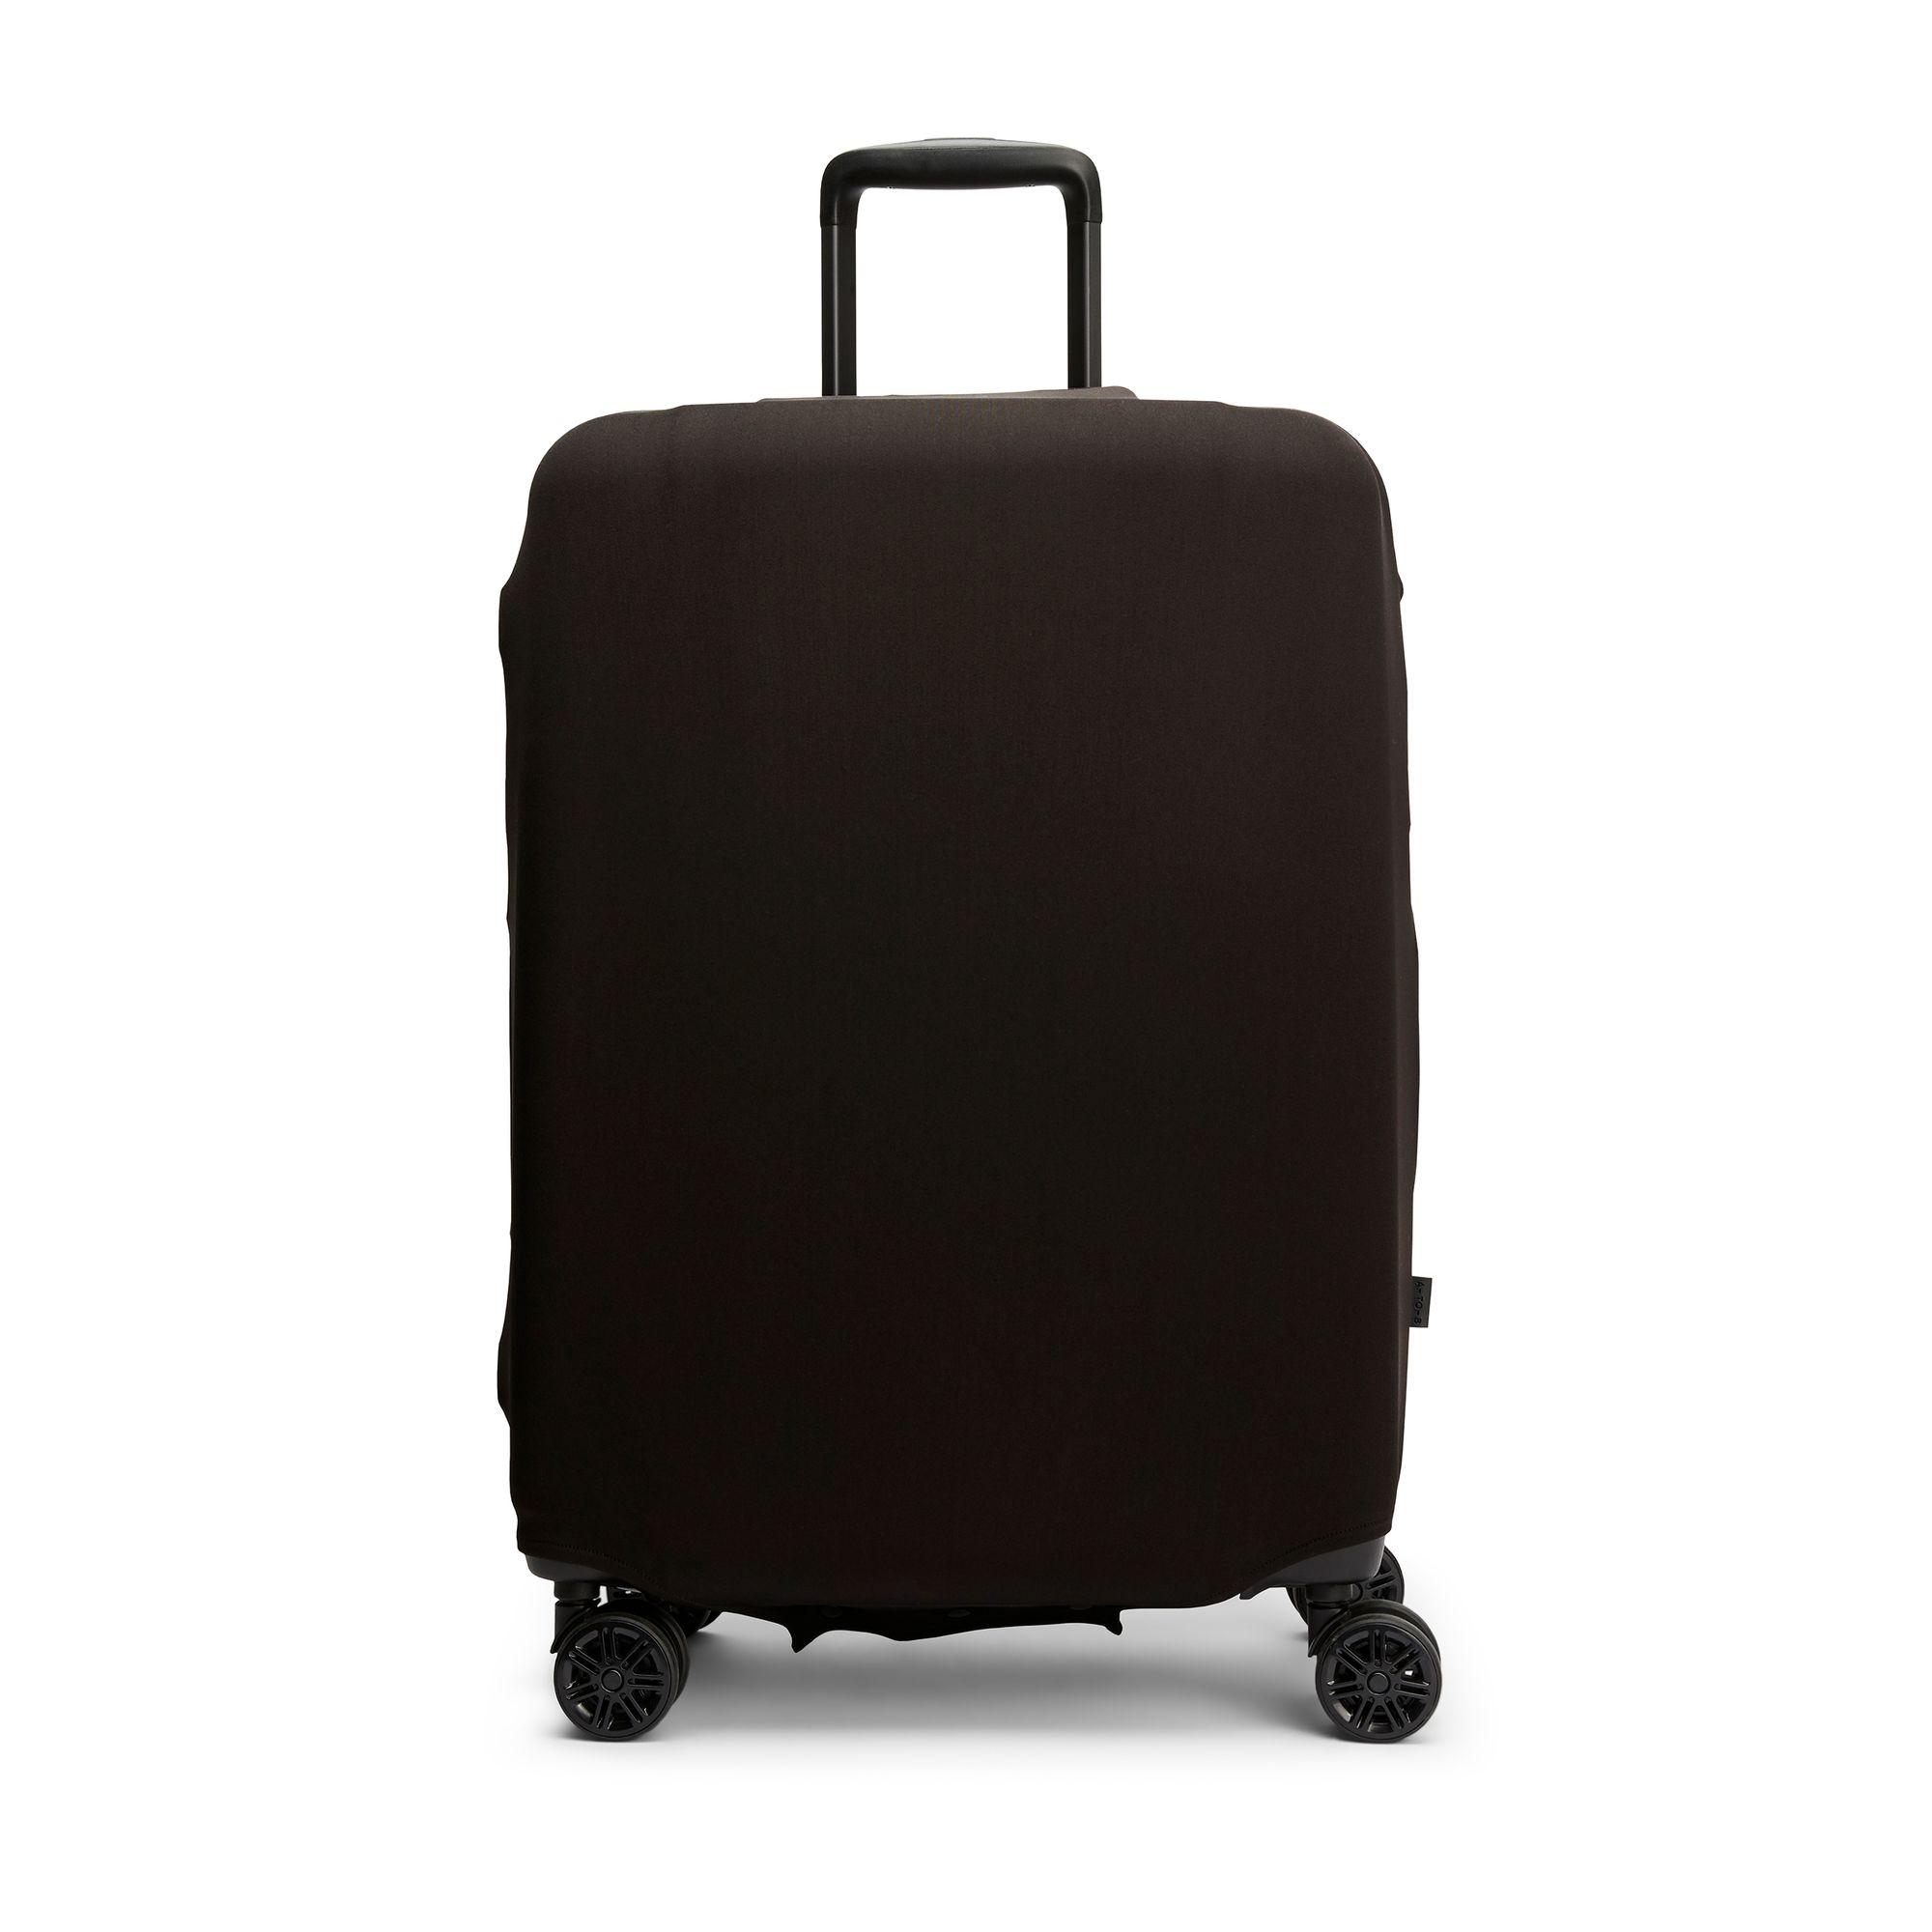 Bilde av A-to-b Luggage Cover, Medium, Svart